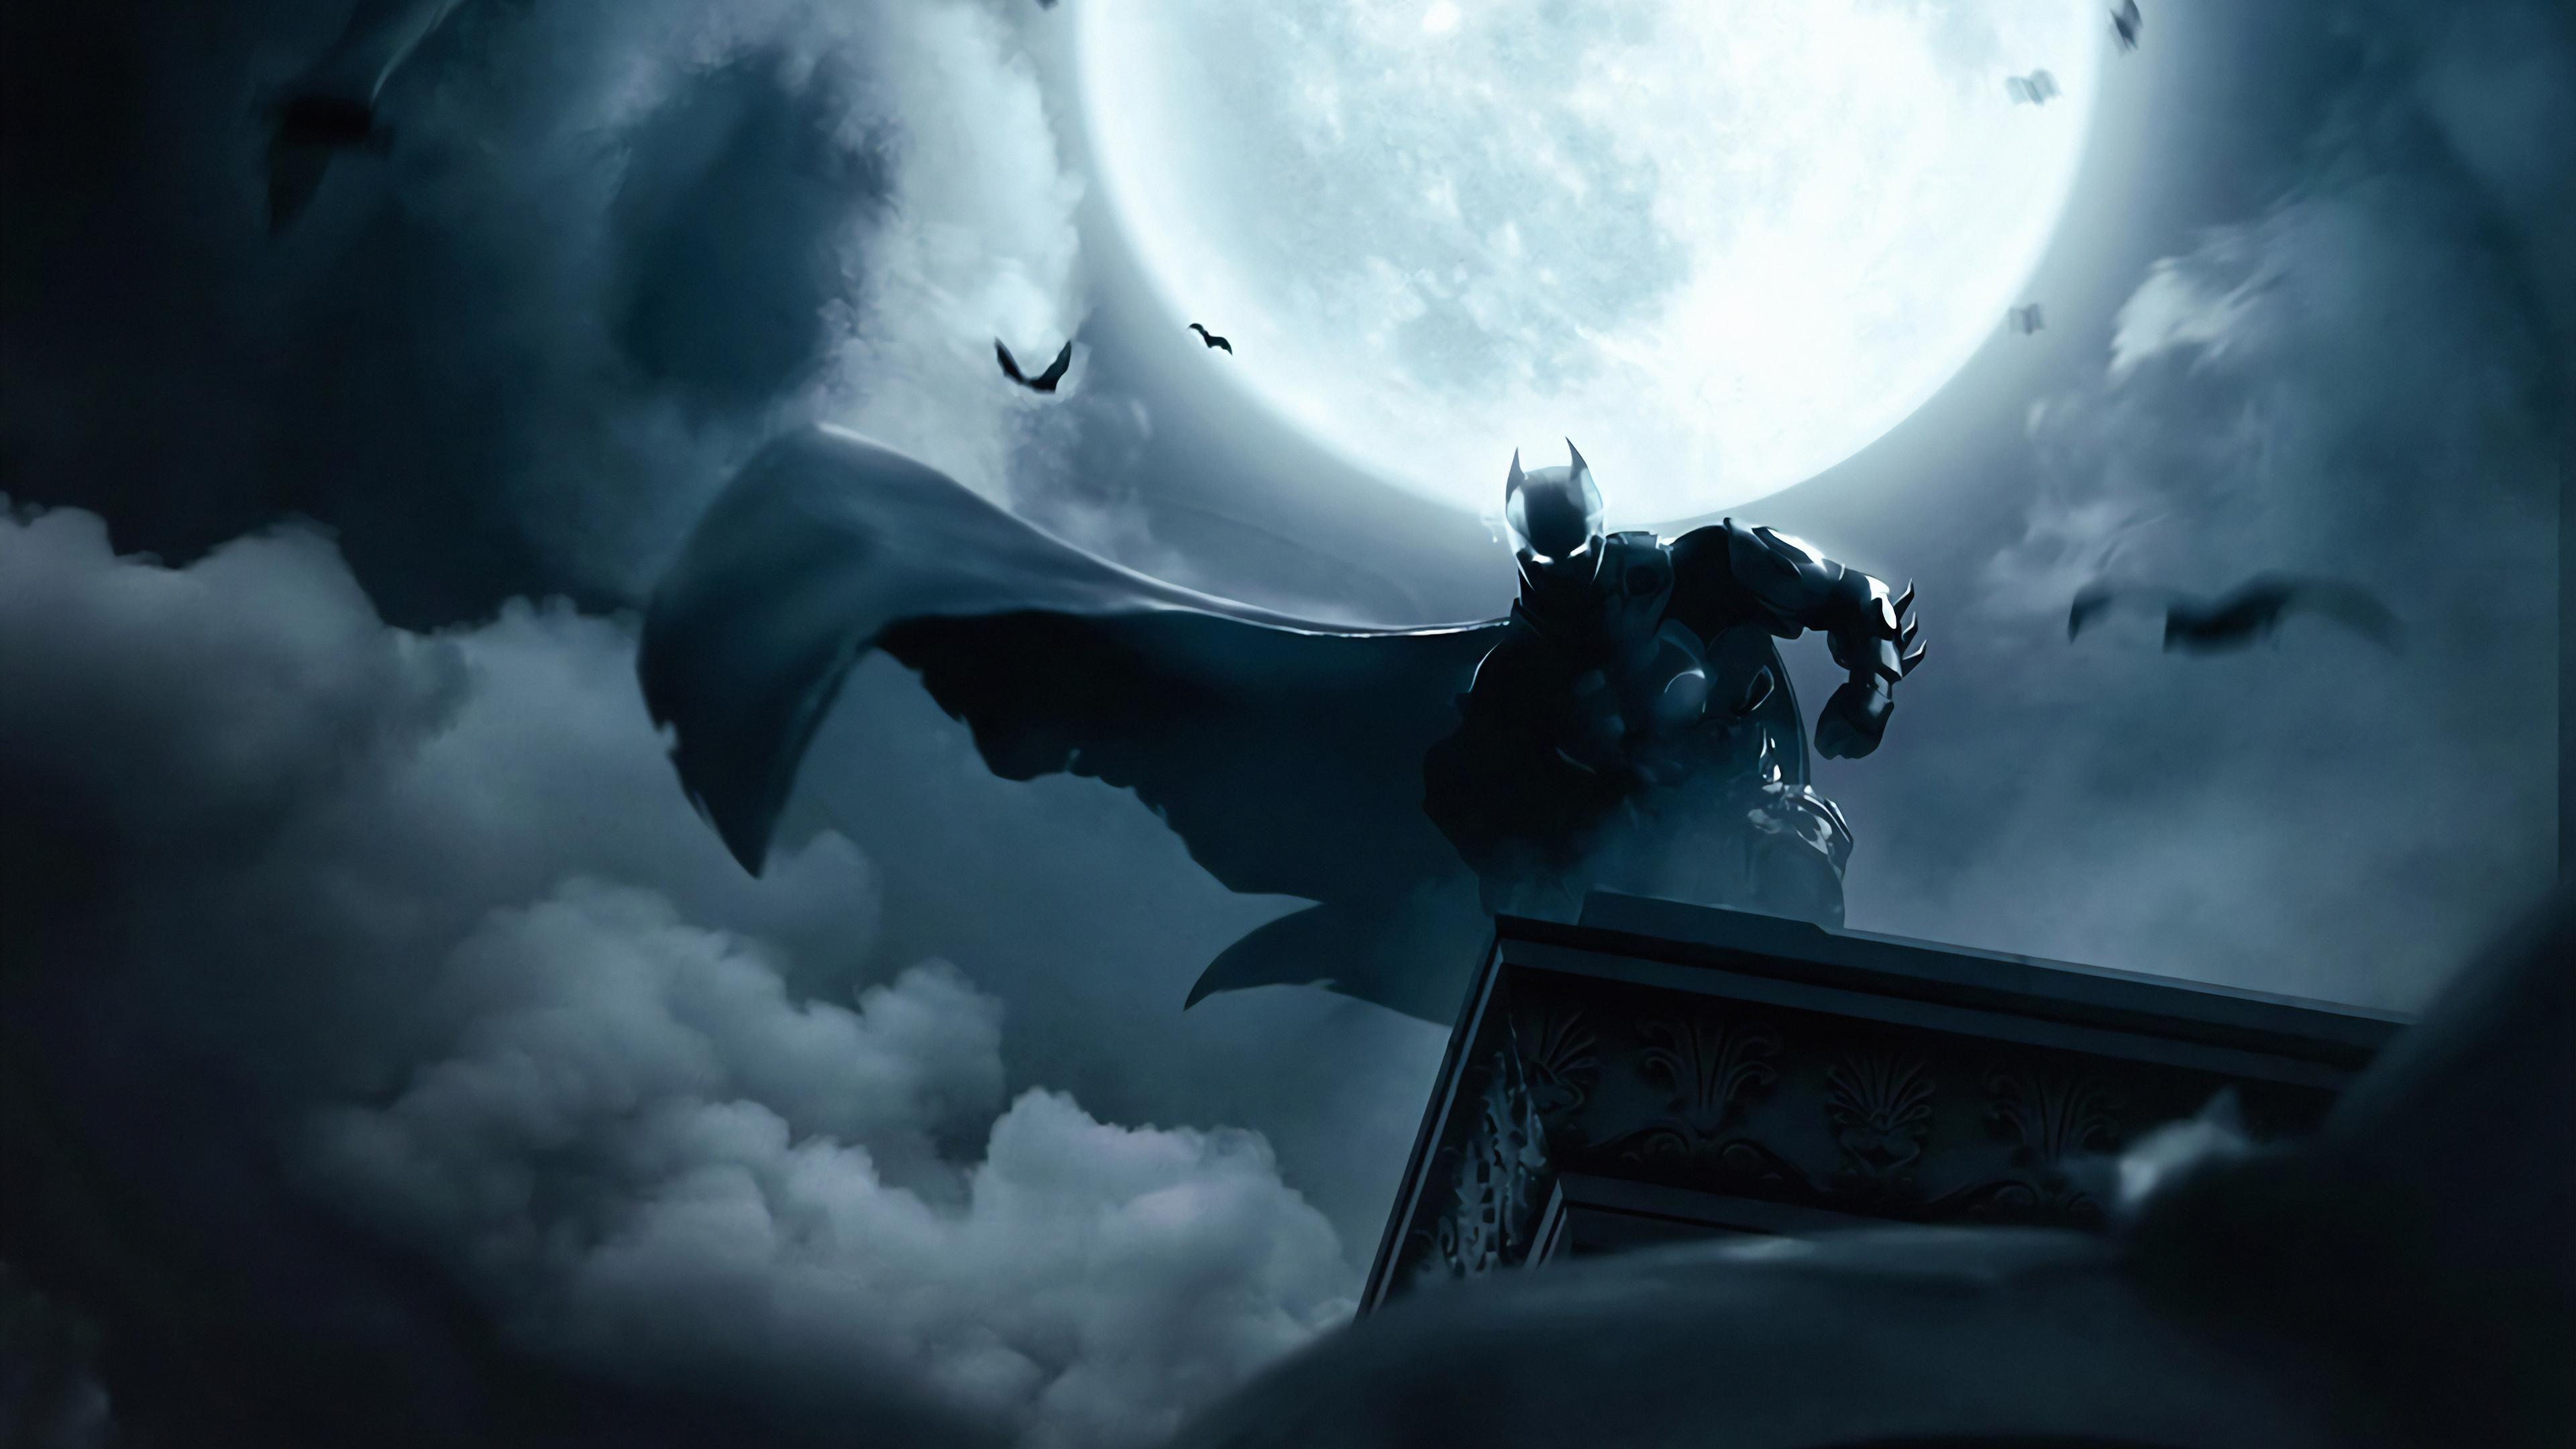 3840x2160 Batman Darknight 4k HD 4k Wallpapers, Images ...